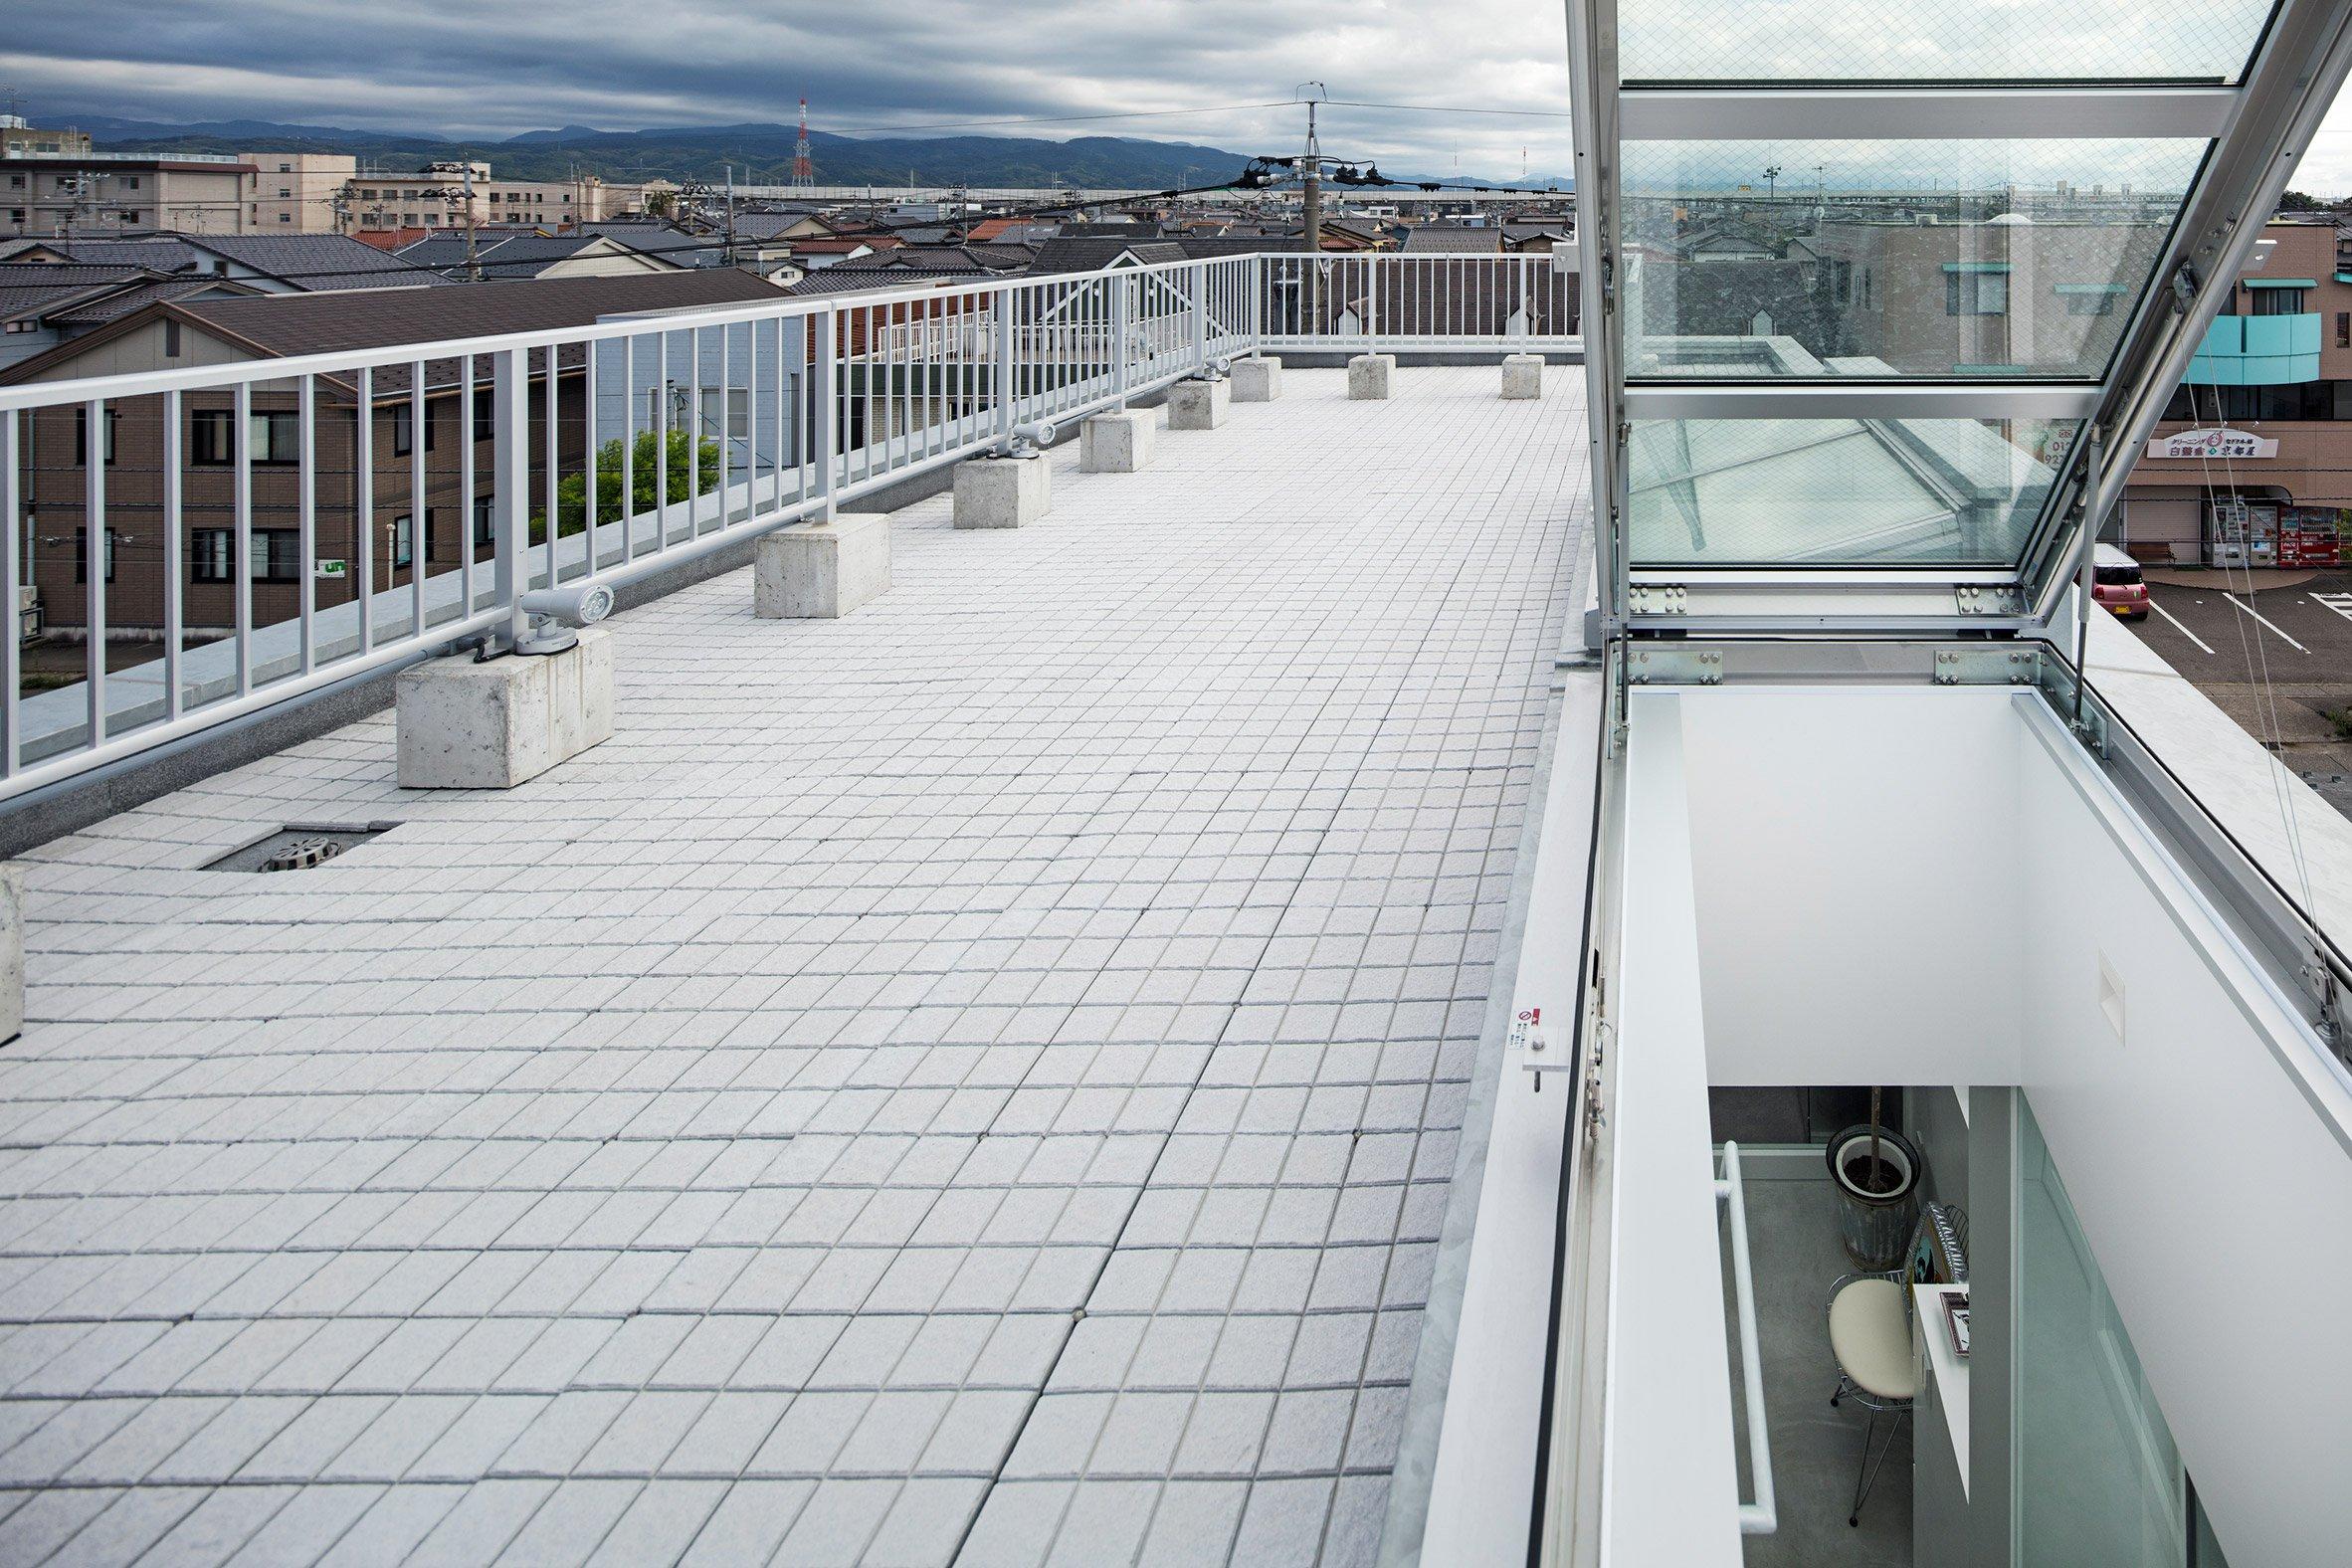 shinbohon-house-k-yuichi-yoshida-associates-architecture-residential-japan-_dezeen_2364_col_15.jpg